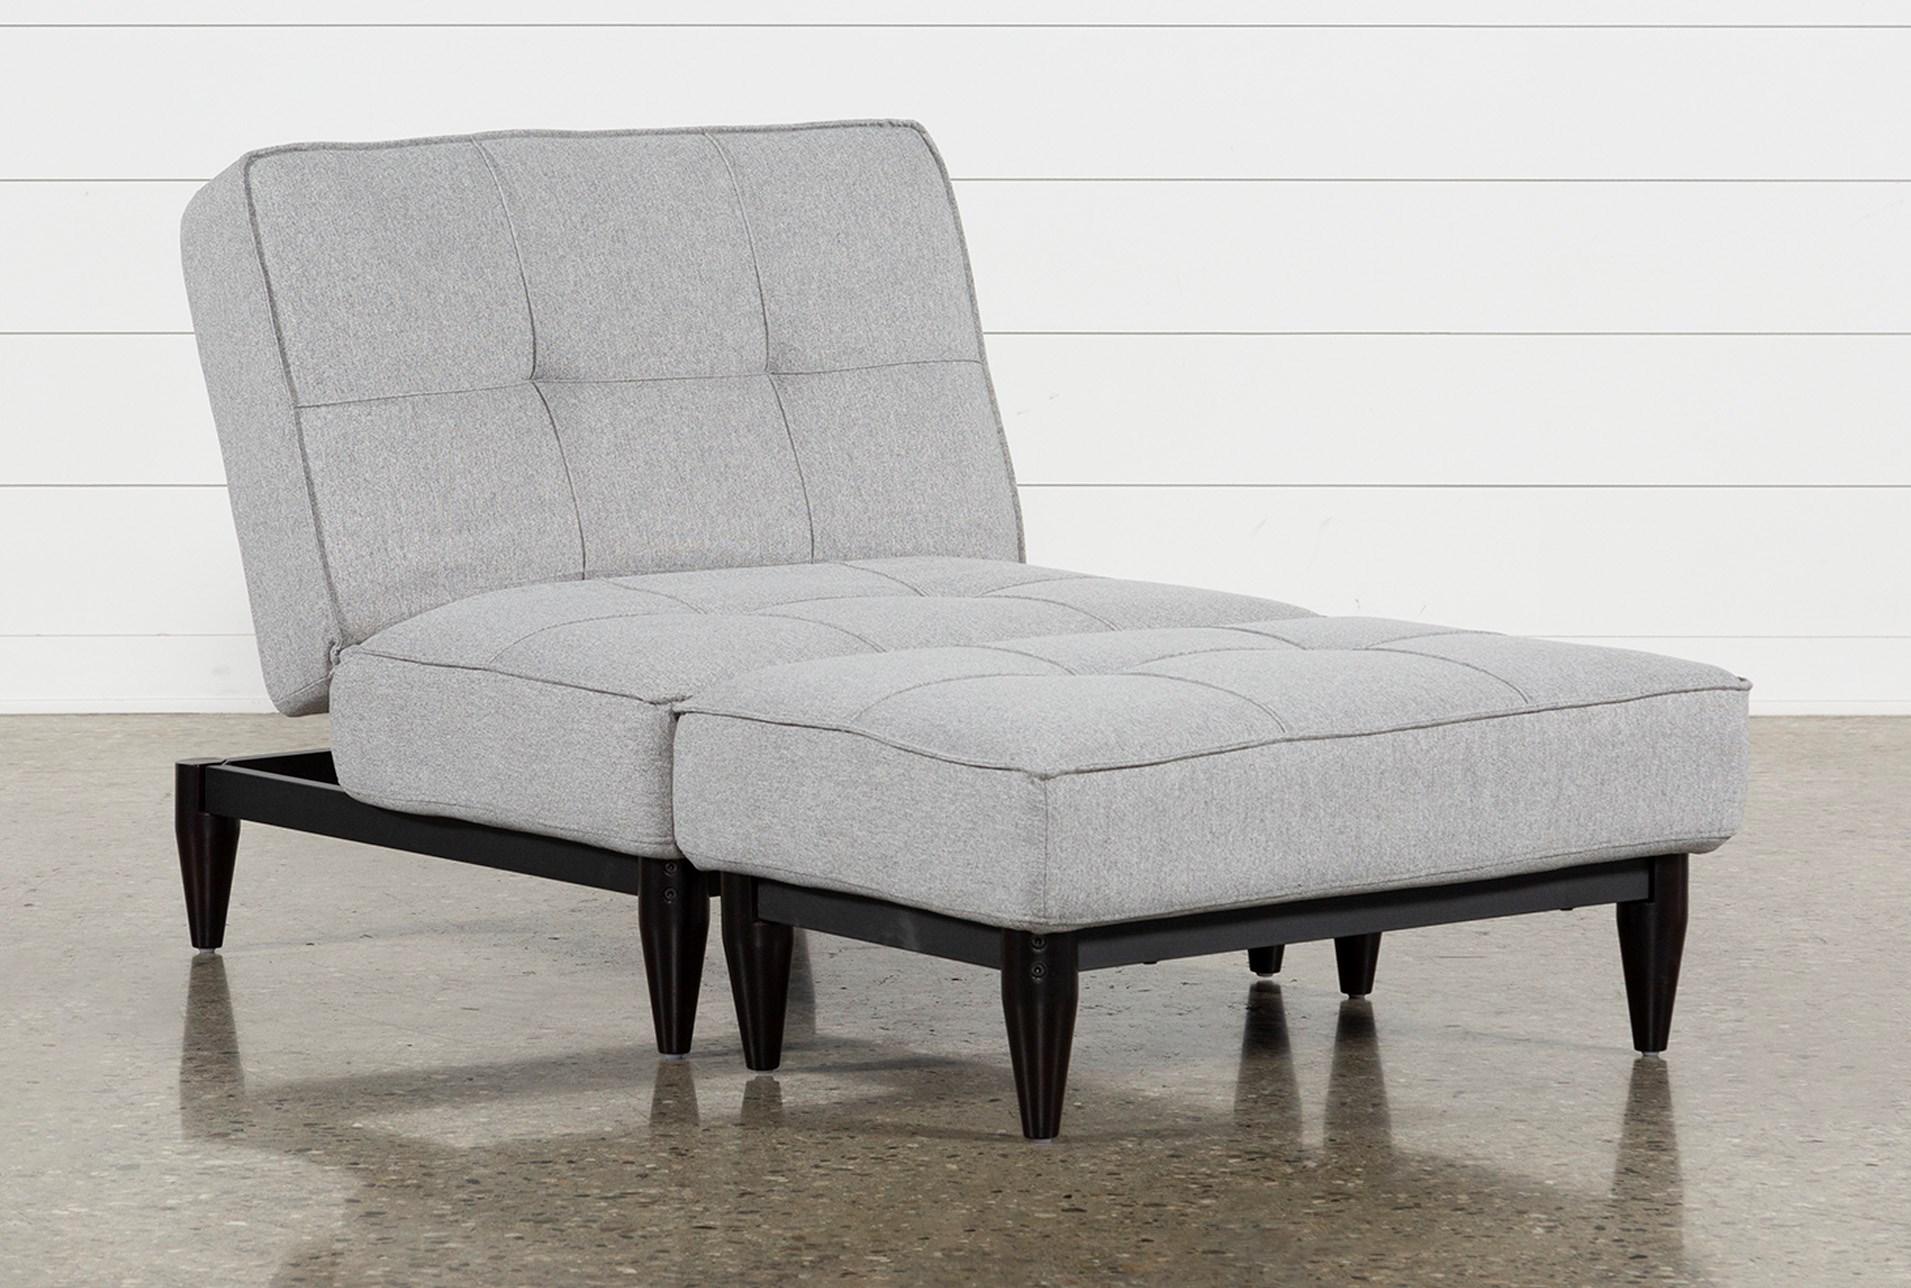 Peachy Paige Grey Convertible Chair And Ottoman Machost Co Dining Chair Design Ideas Machostcouk